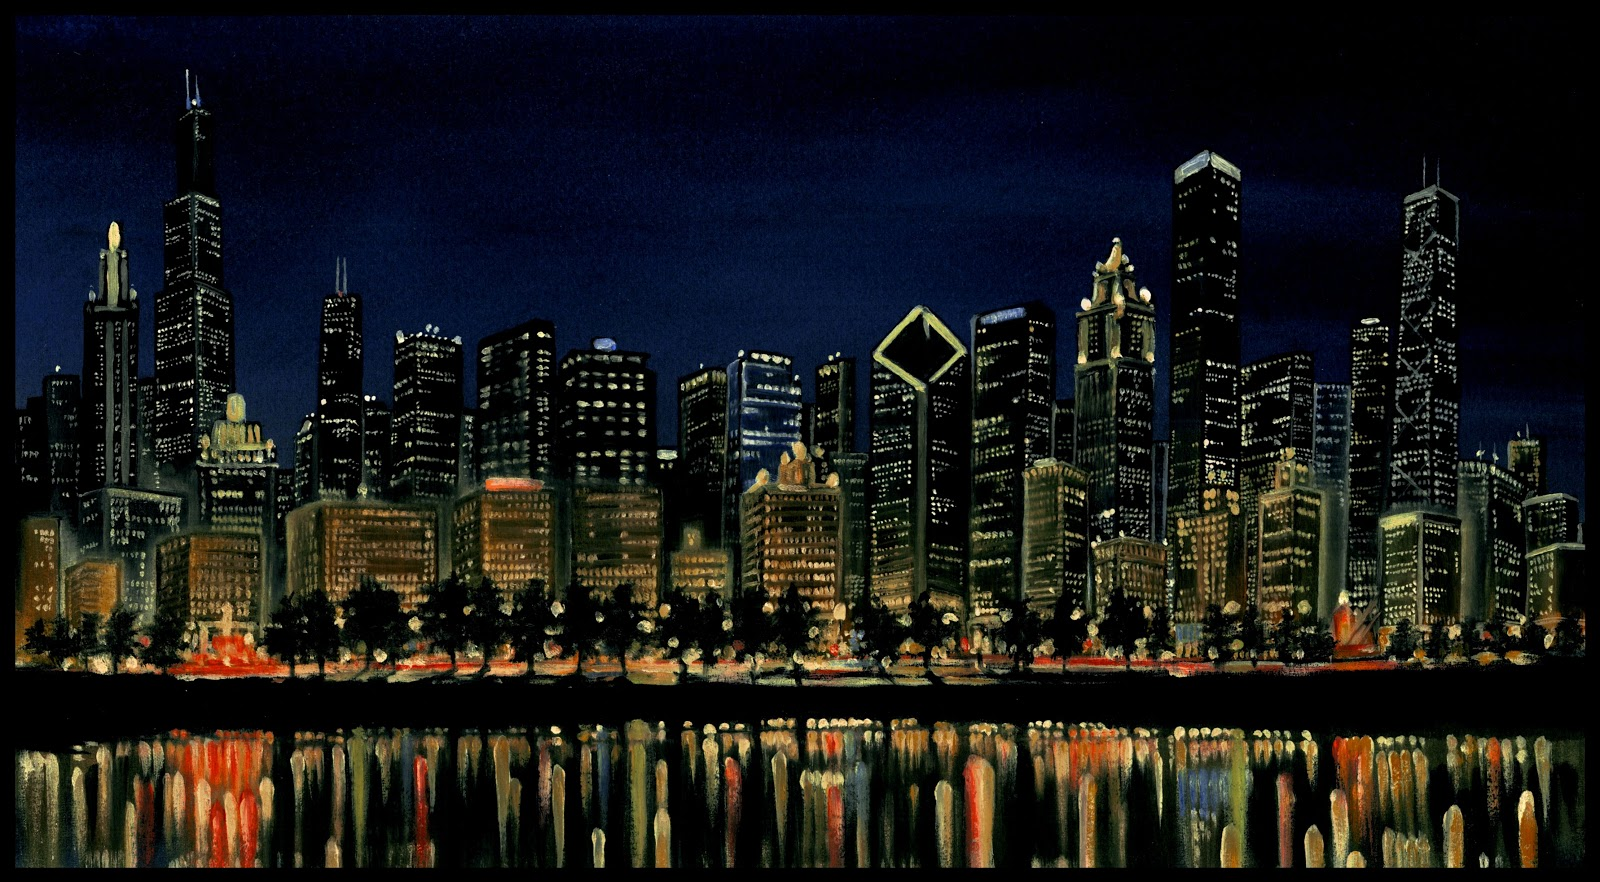 New York Skyline Wallpaper Free Desktop Full Hd Wallpapers